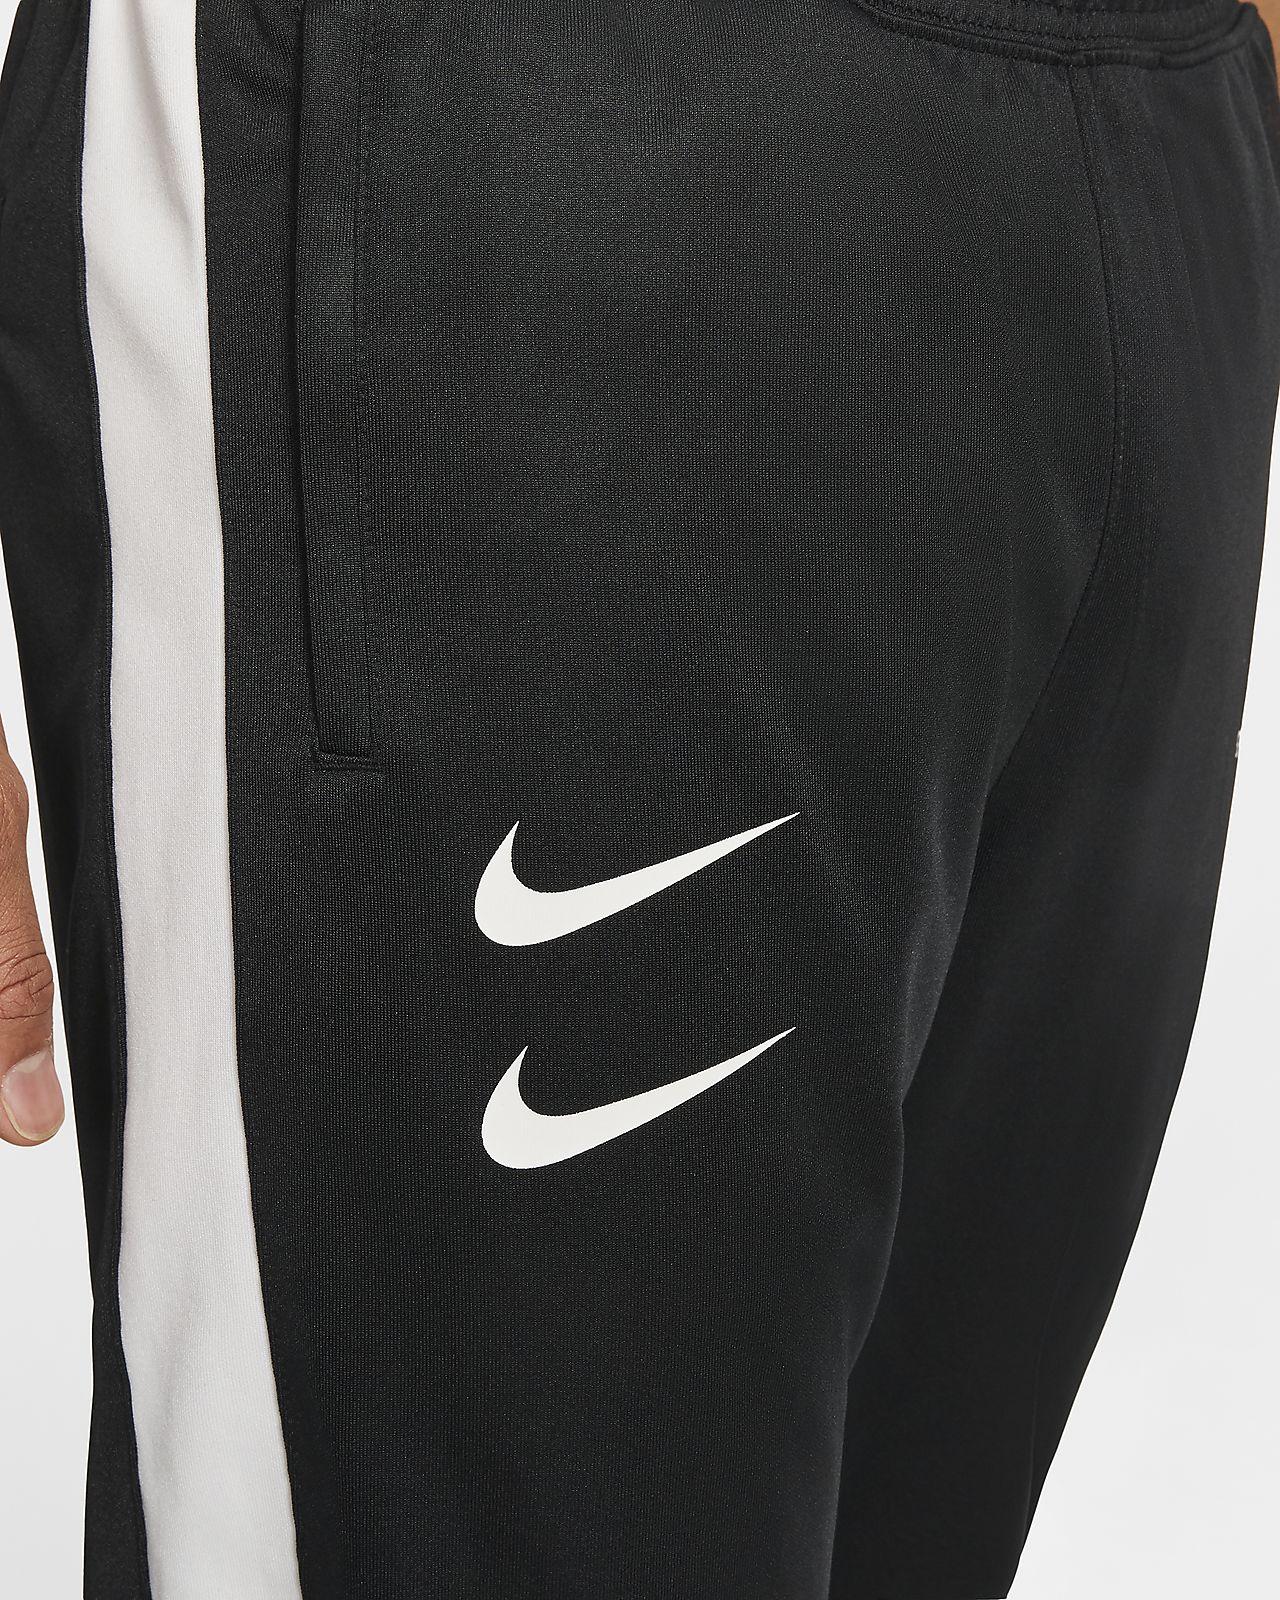 Pantaloni Nike Sportswear Swoosh Uomo